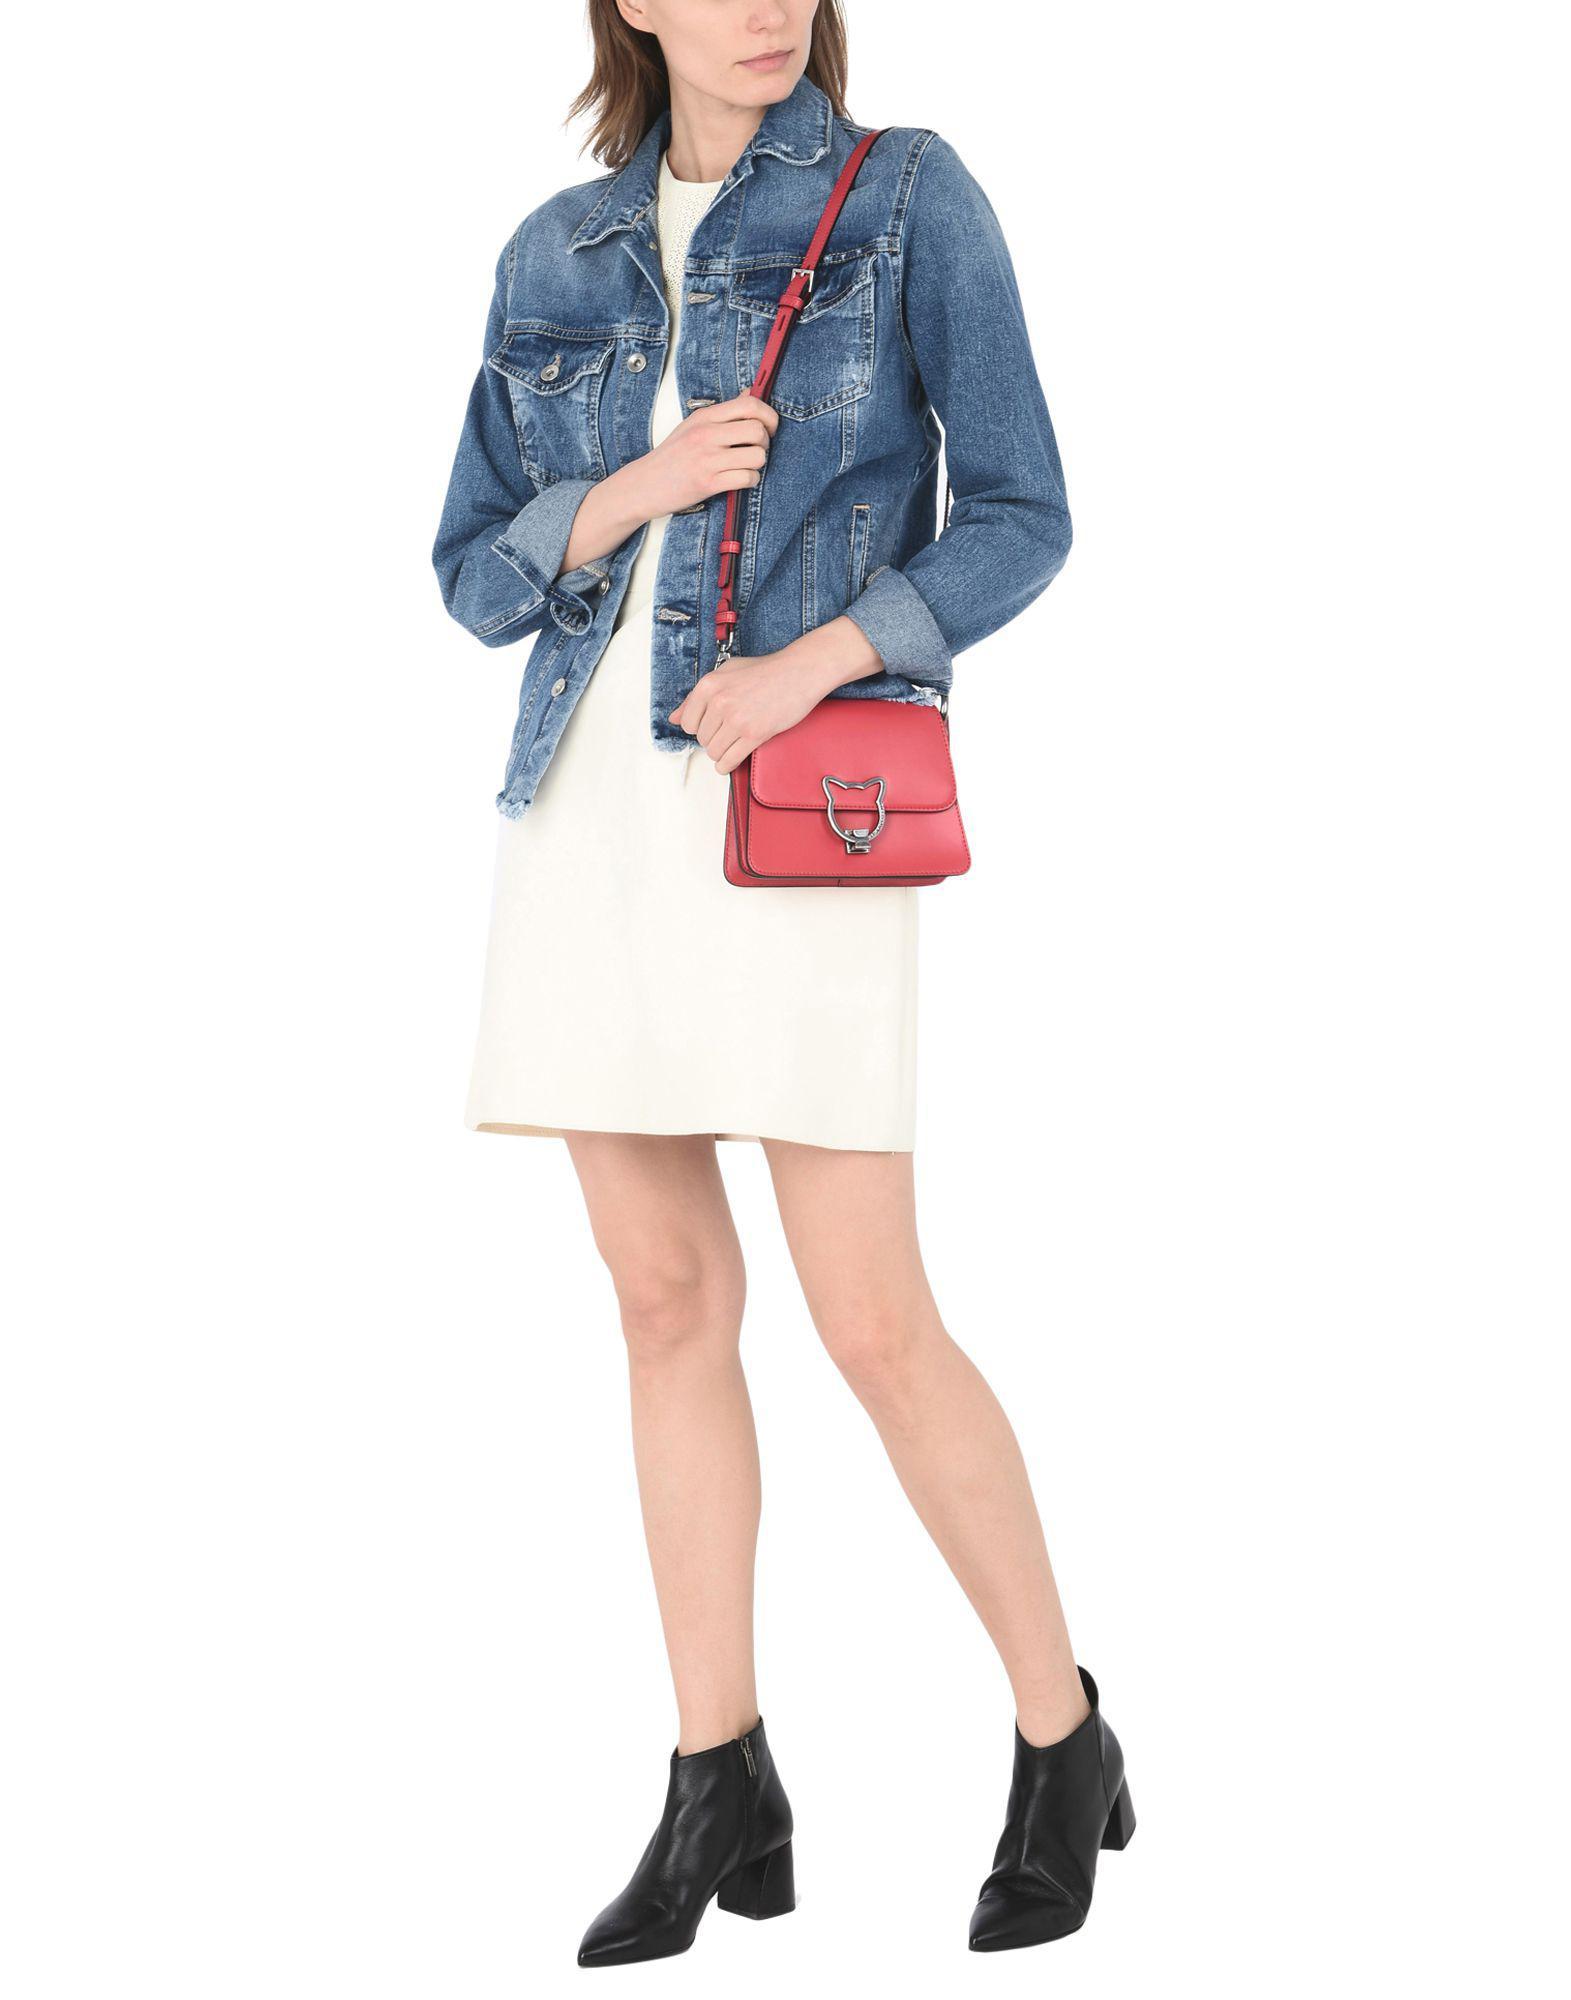 Karl Lagerfeld Leather Cross-body Bag in Garnet (Pink)